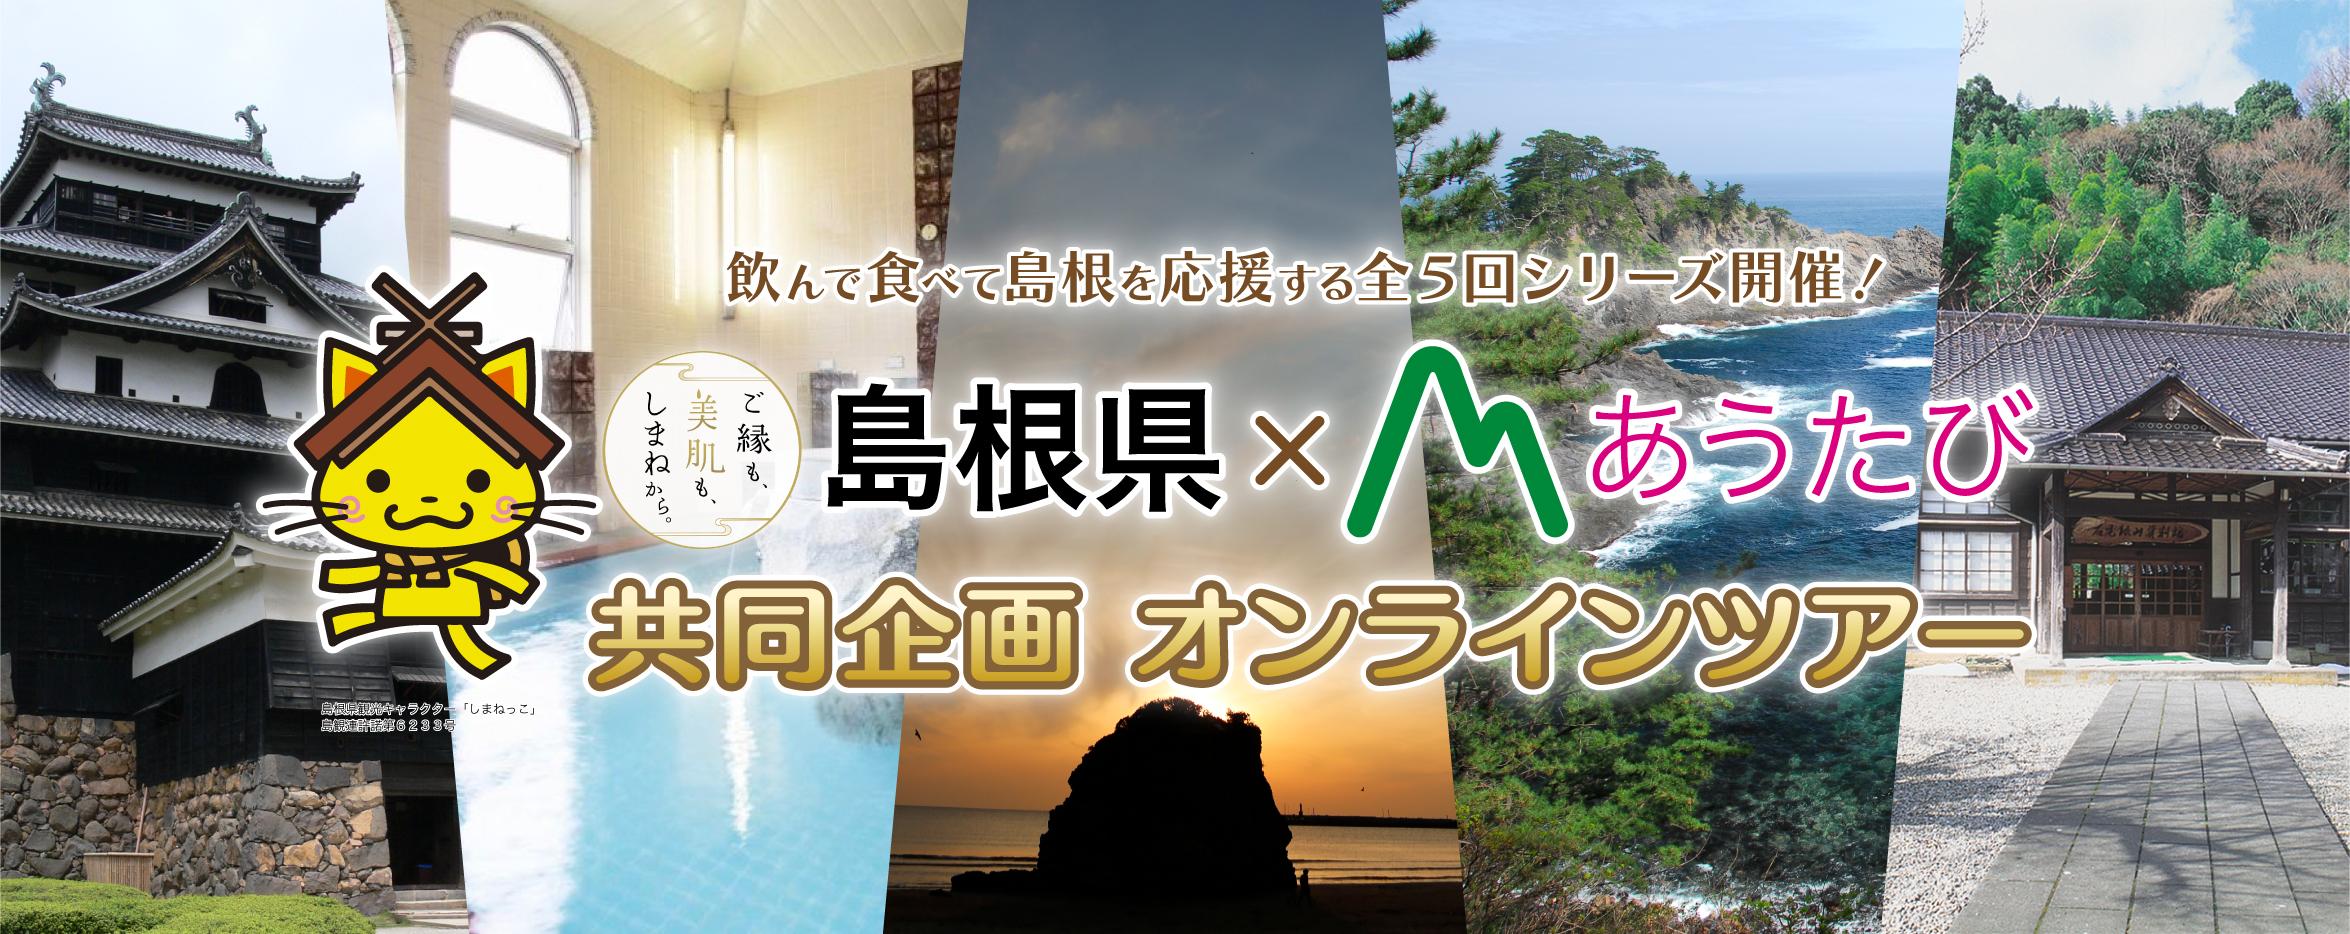 autabi_shimane_tour_top_img01